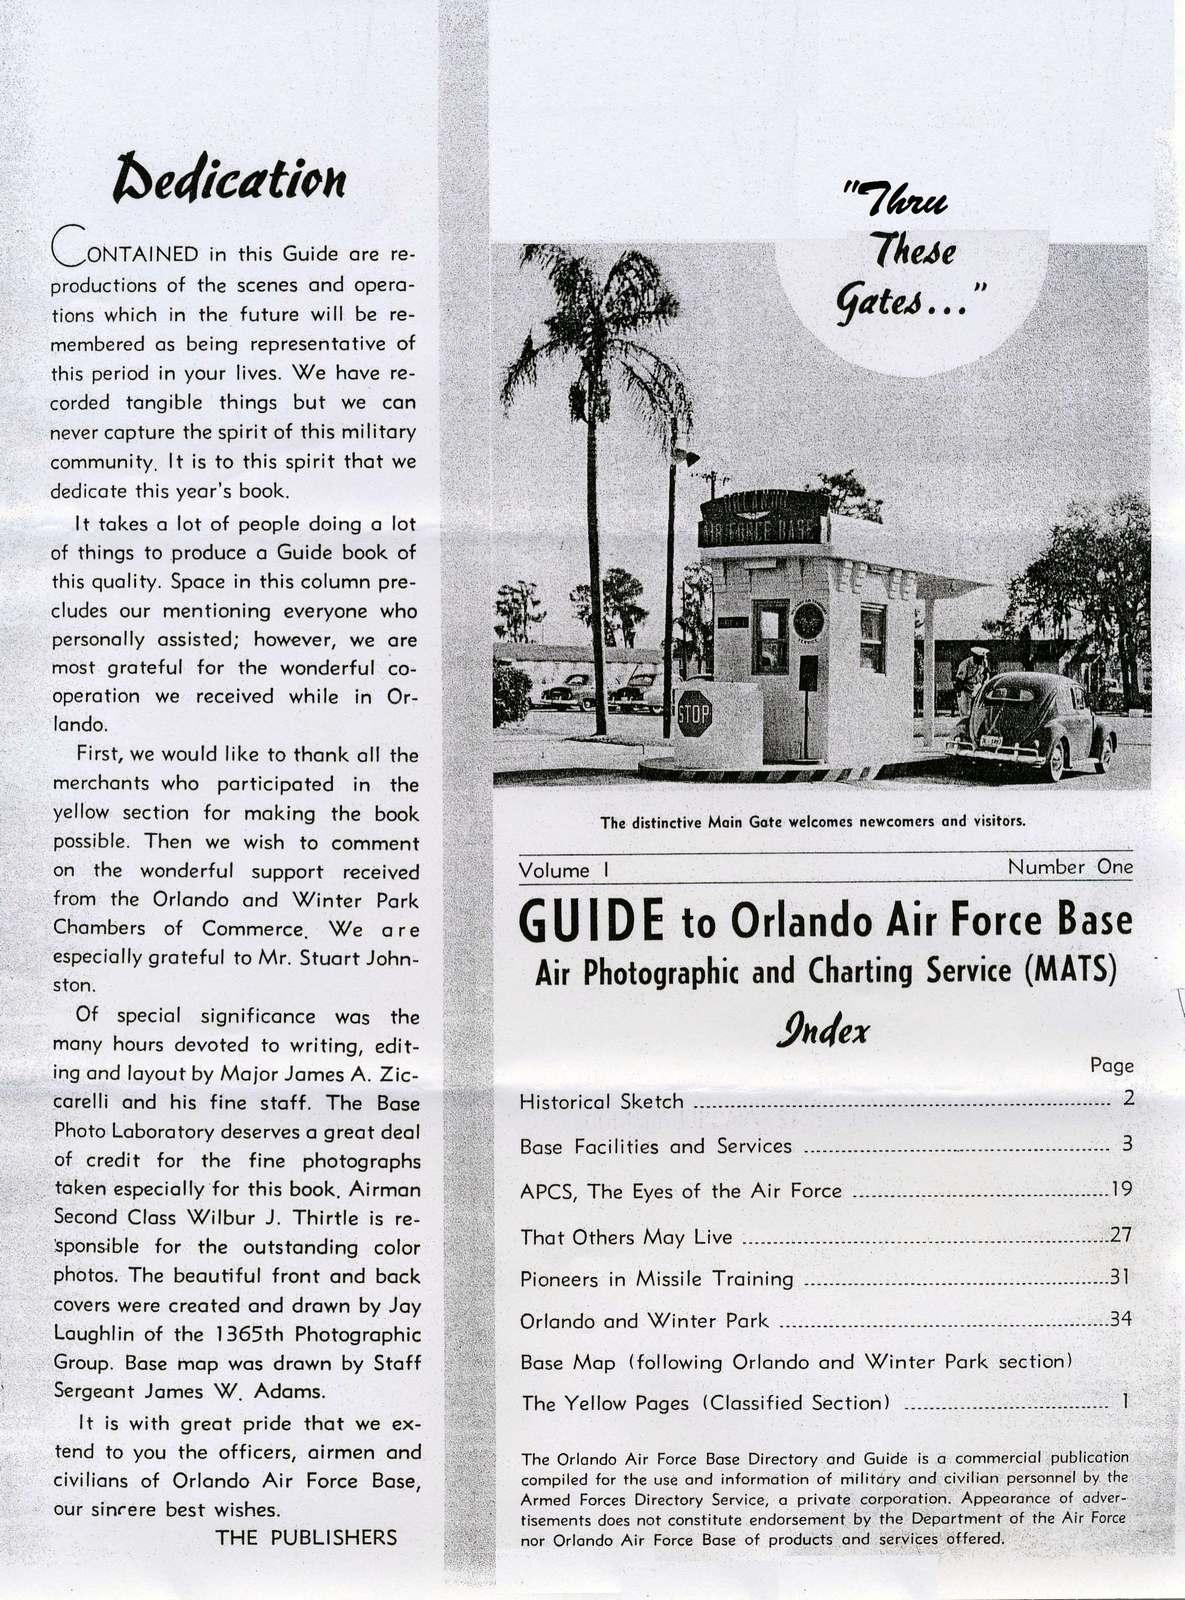 Orlando AFB Guide